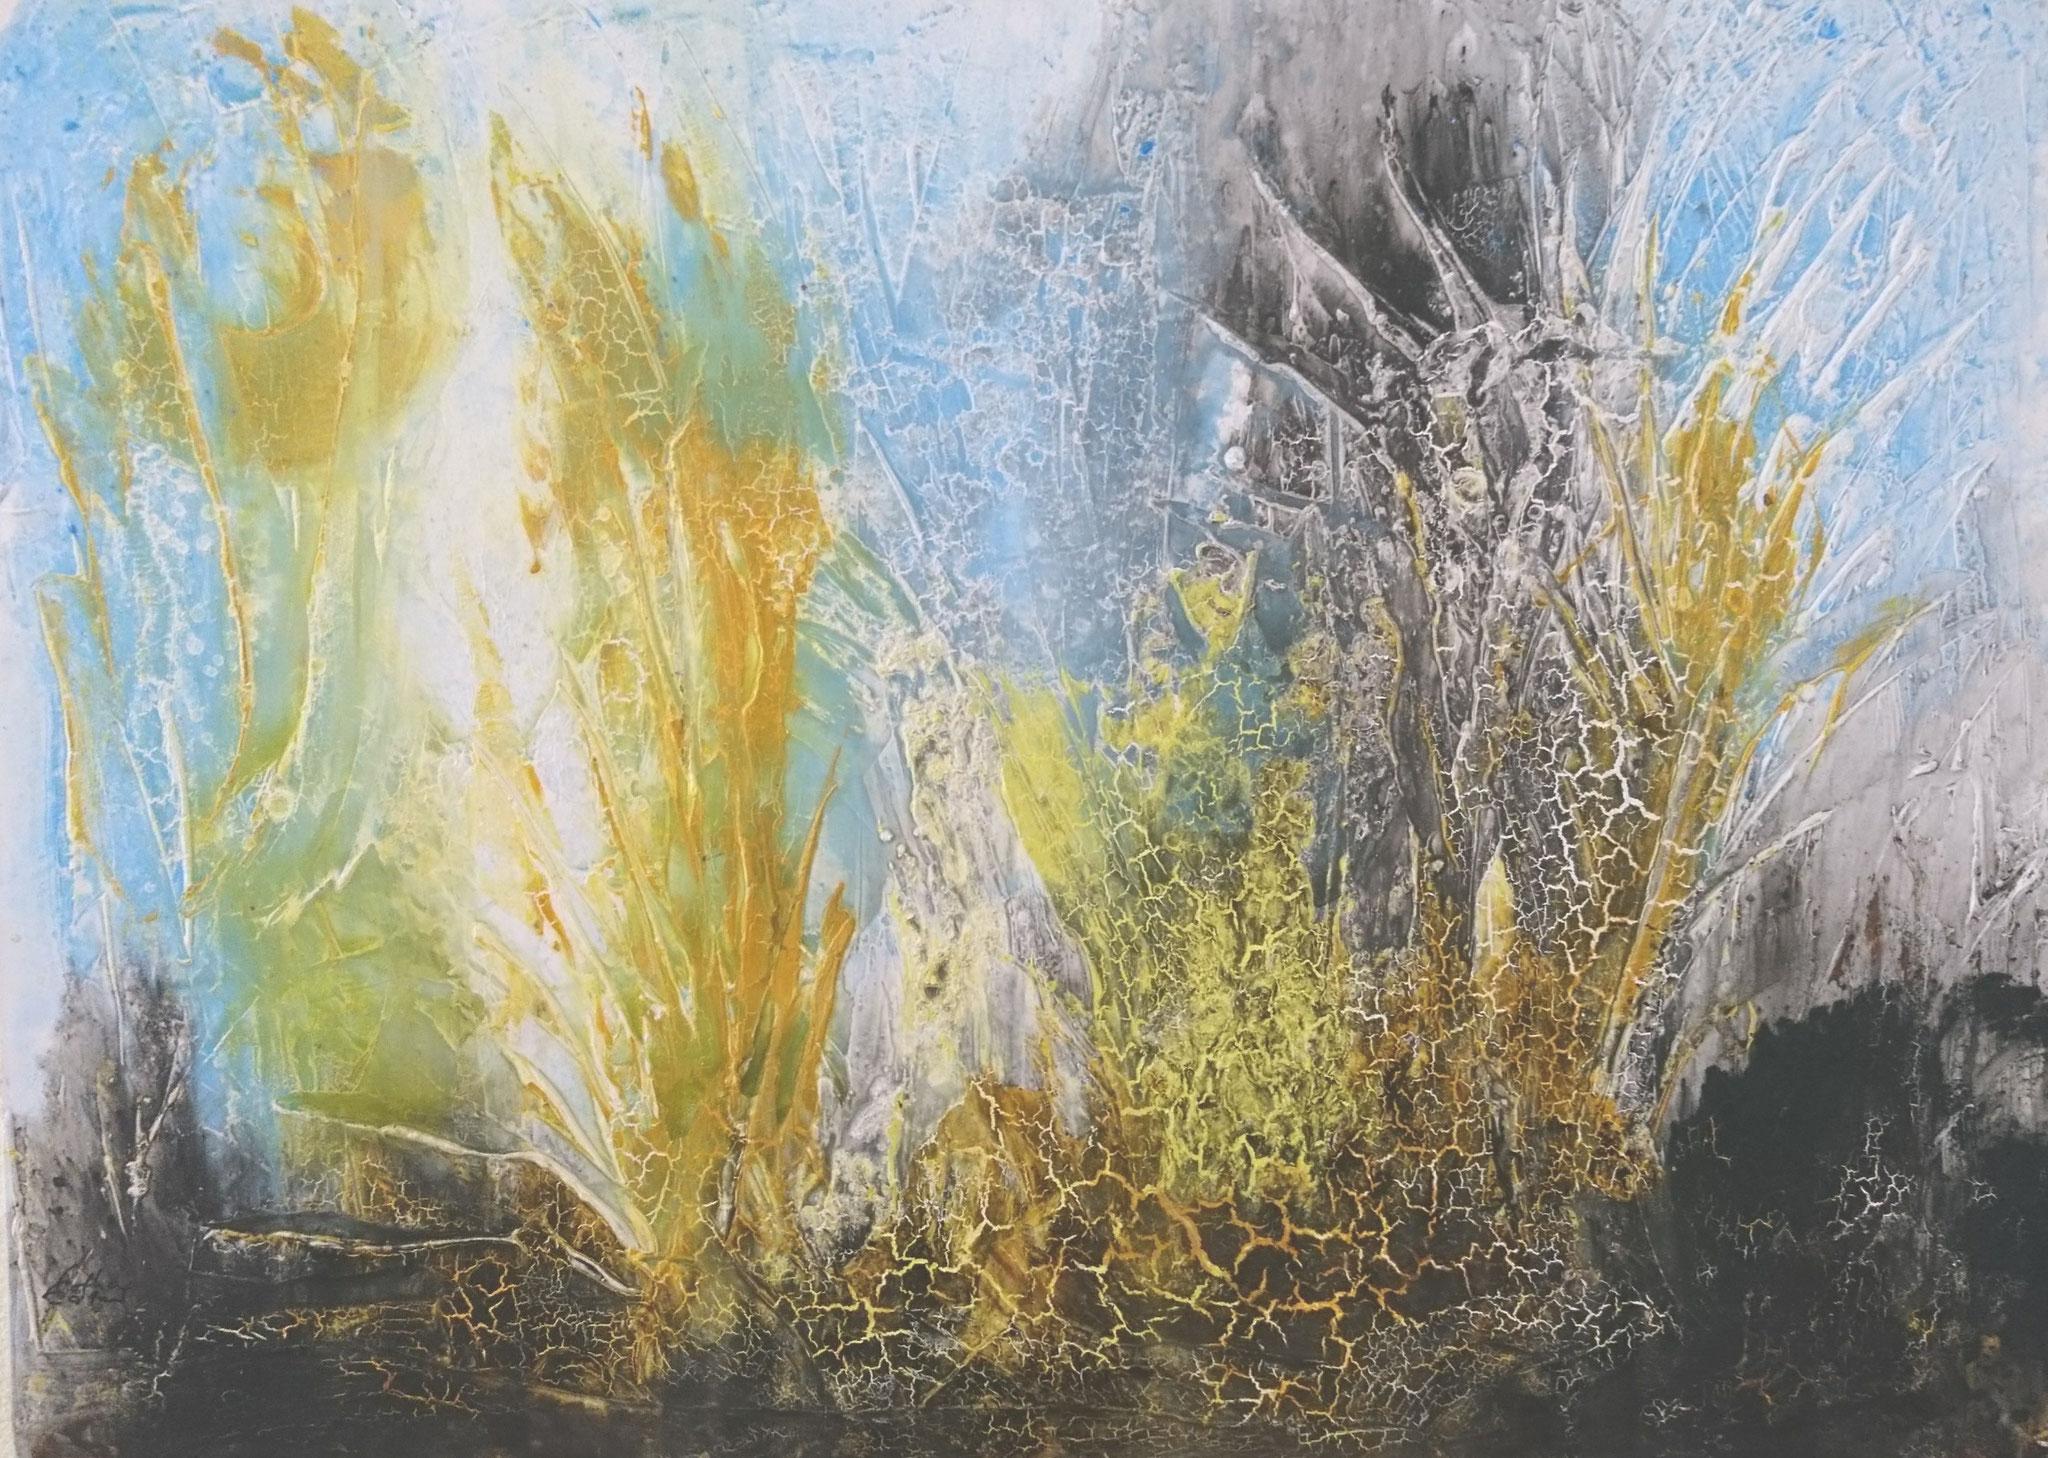 """Landschaft"" Acryl auf Leinwand 120x160cm"